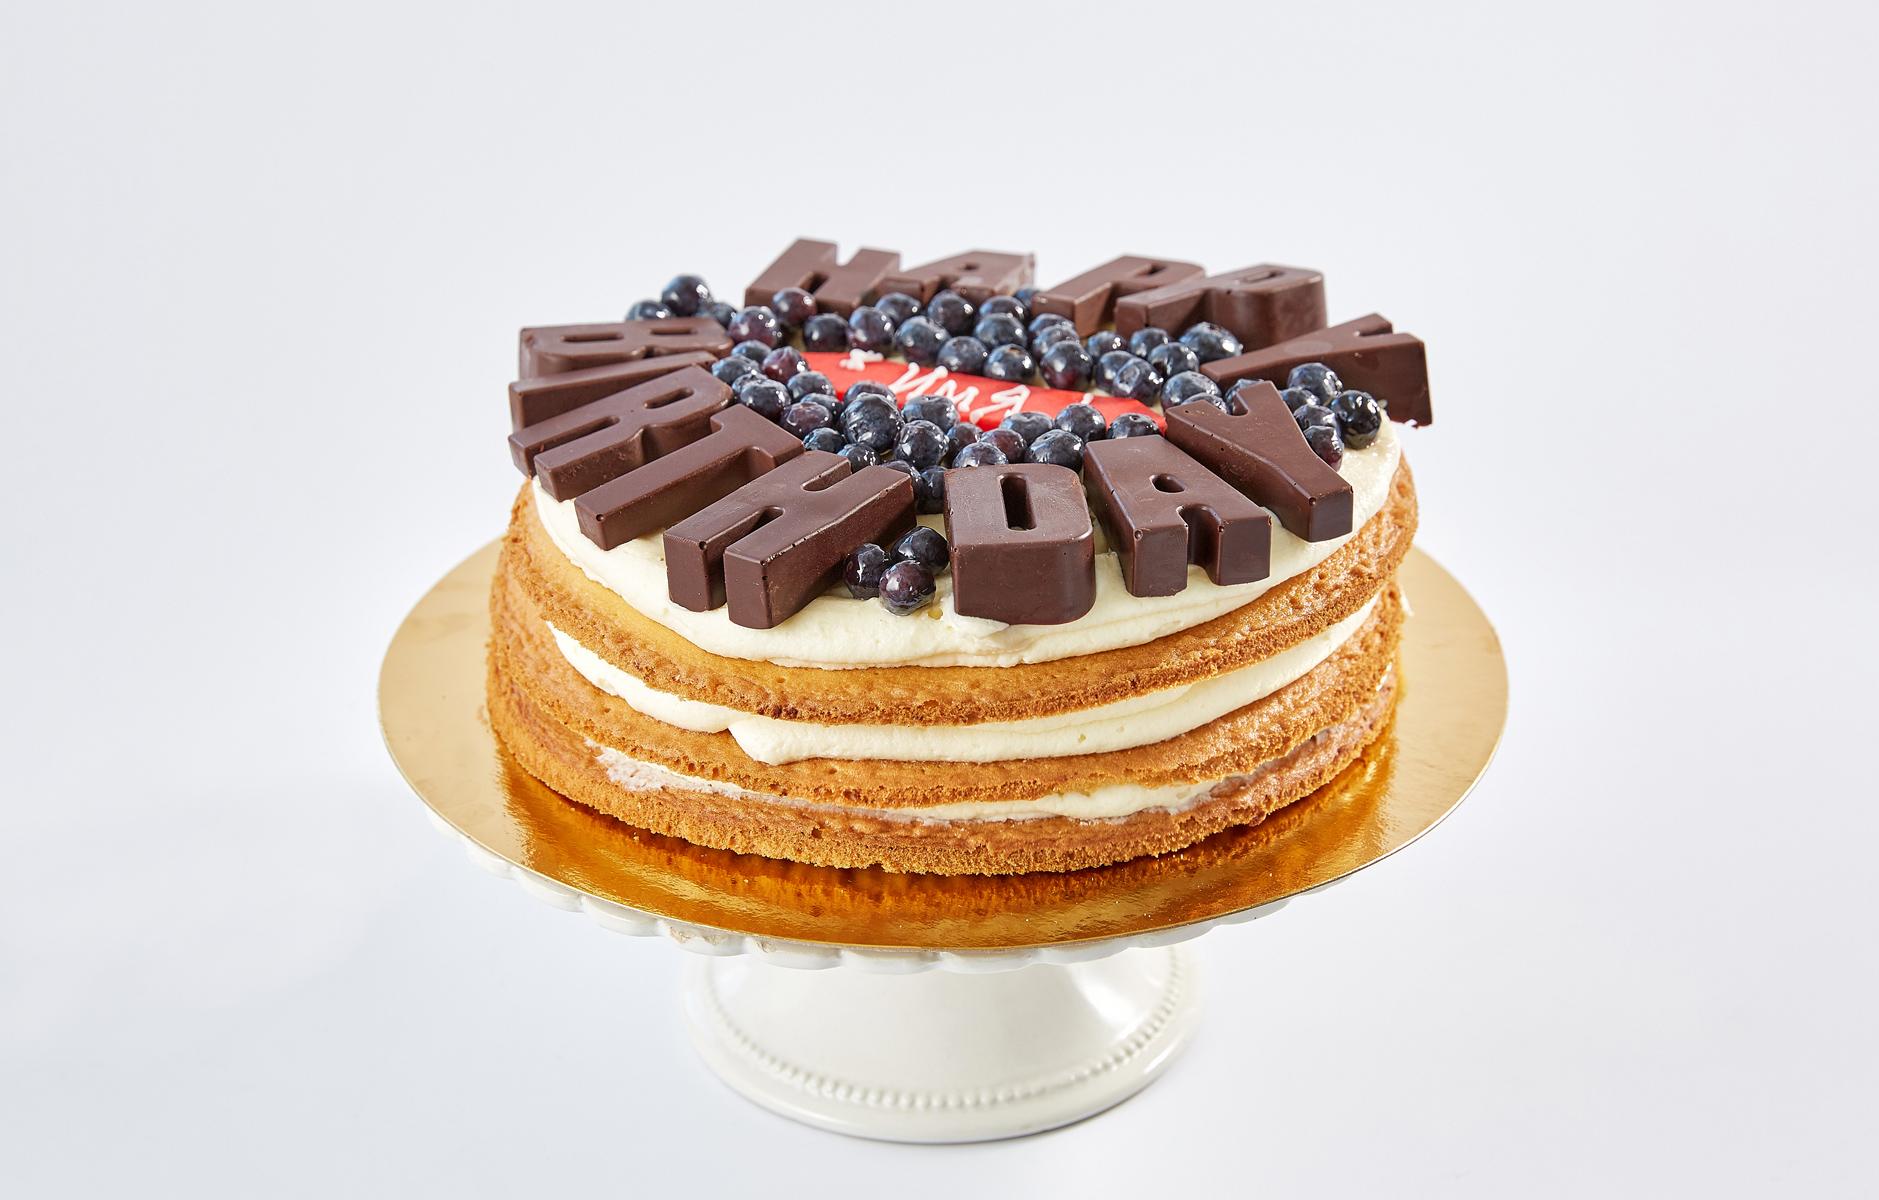 Торт на день рождения в виде книги фото 3